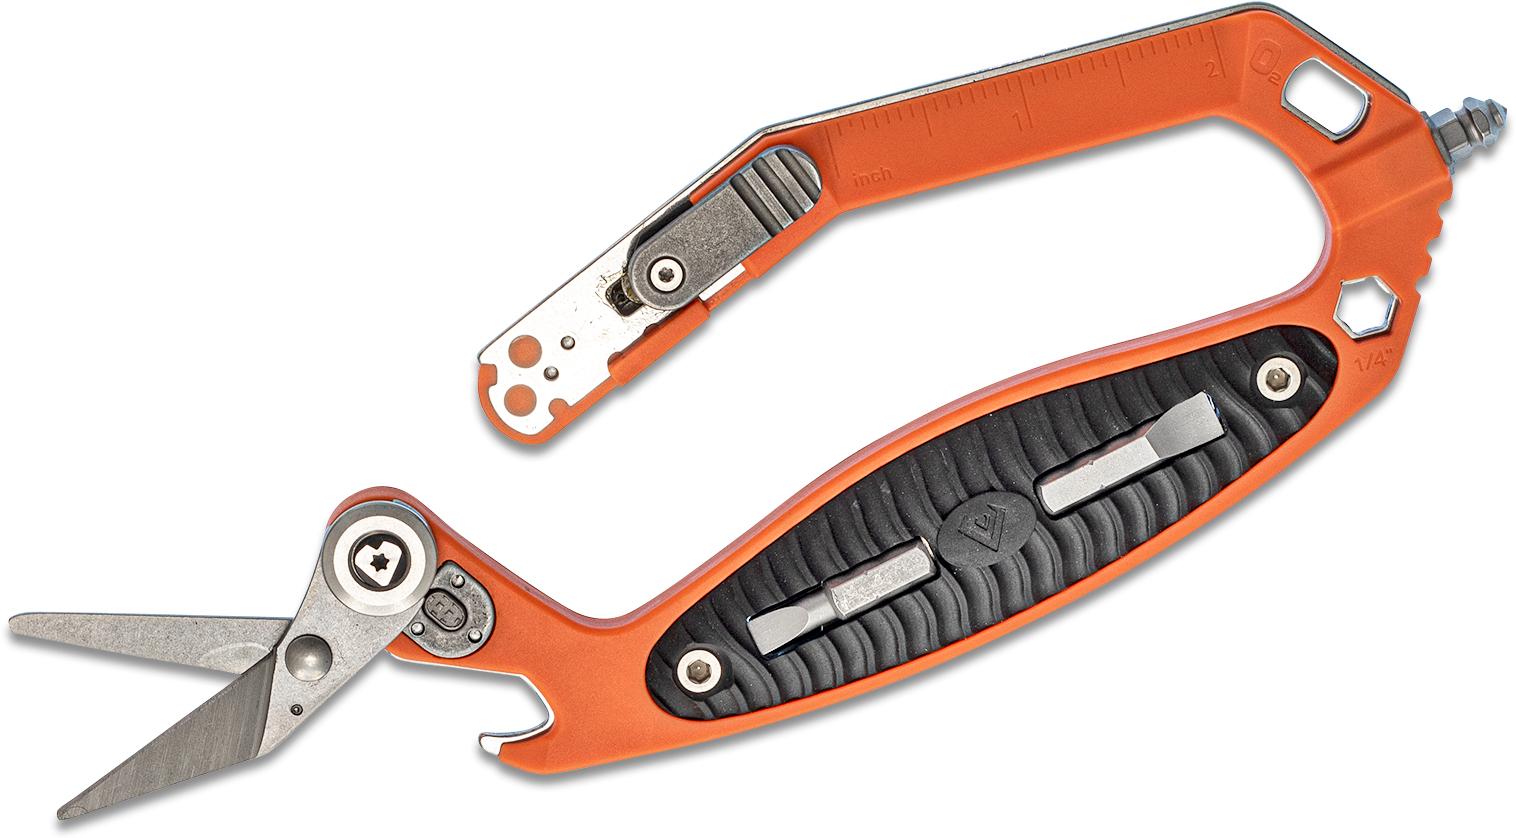 V Nives CRAB Cut Rescue Assist Break Multi-Tool, Orange FRN